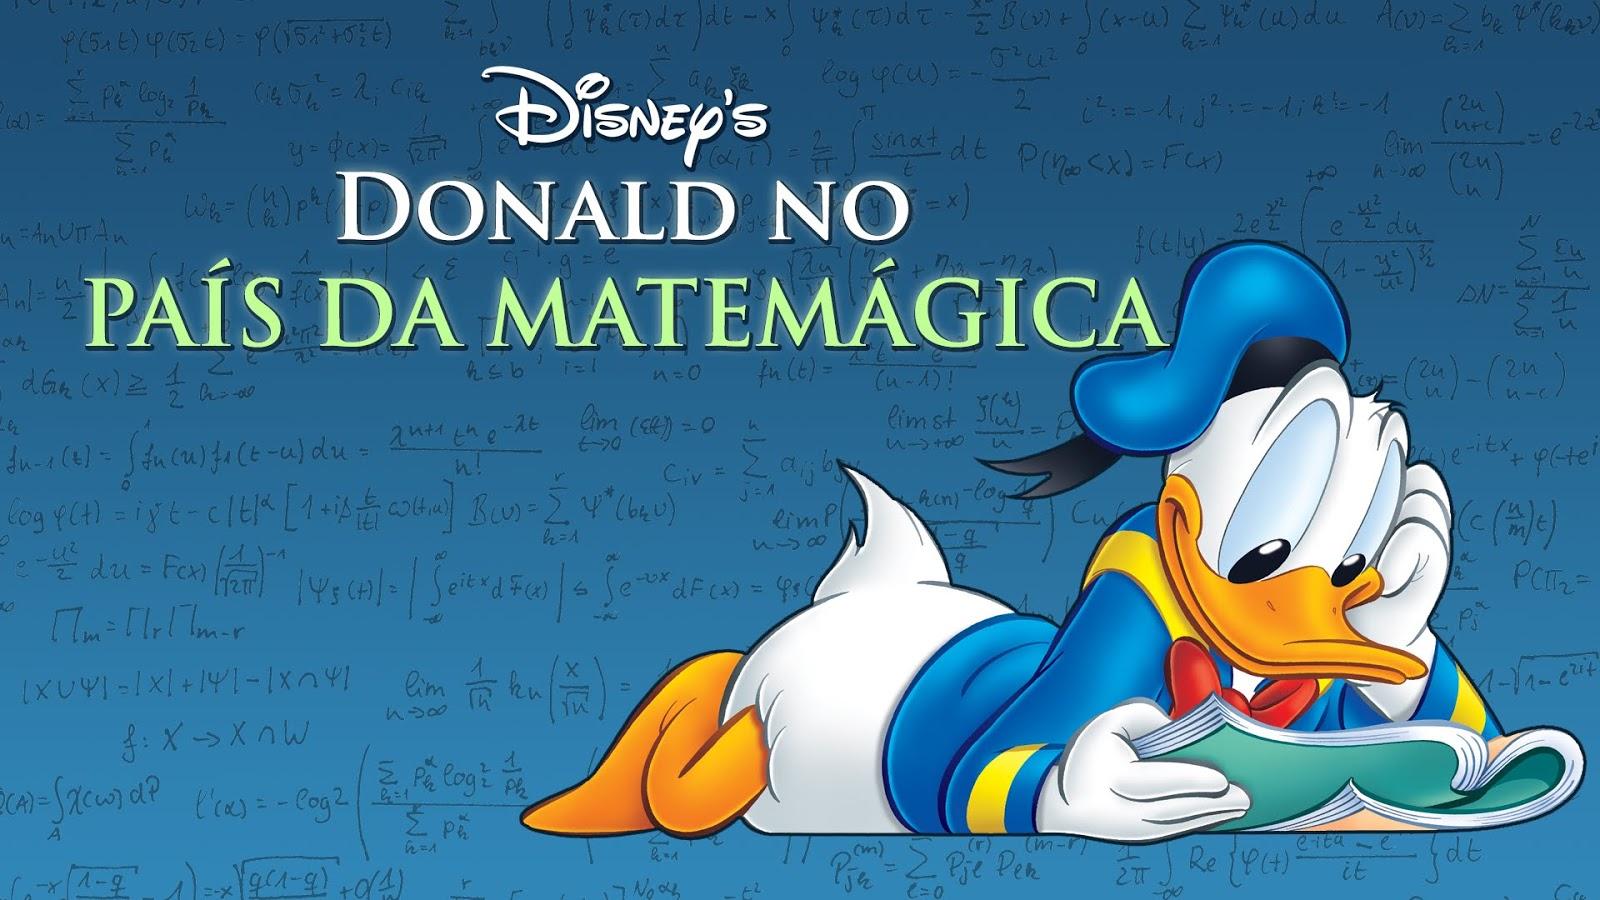 Xeque Math Filme Donald No Pais Da Matemagica Donald In